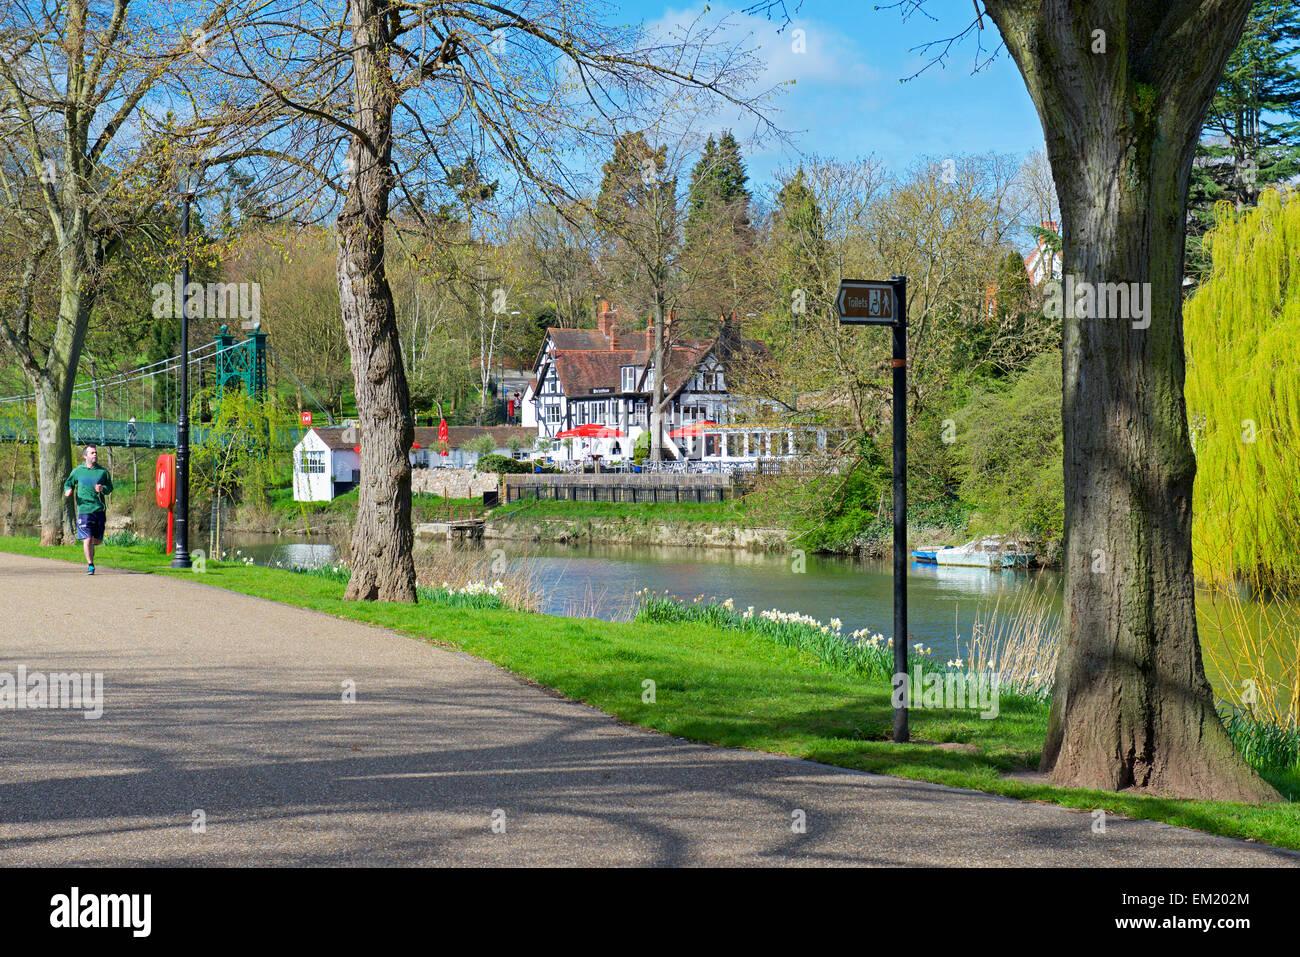 Man jogging on path next to the River Severn, Shrewsbury, Shropshire, England UK - Stock Image